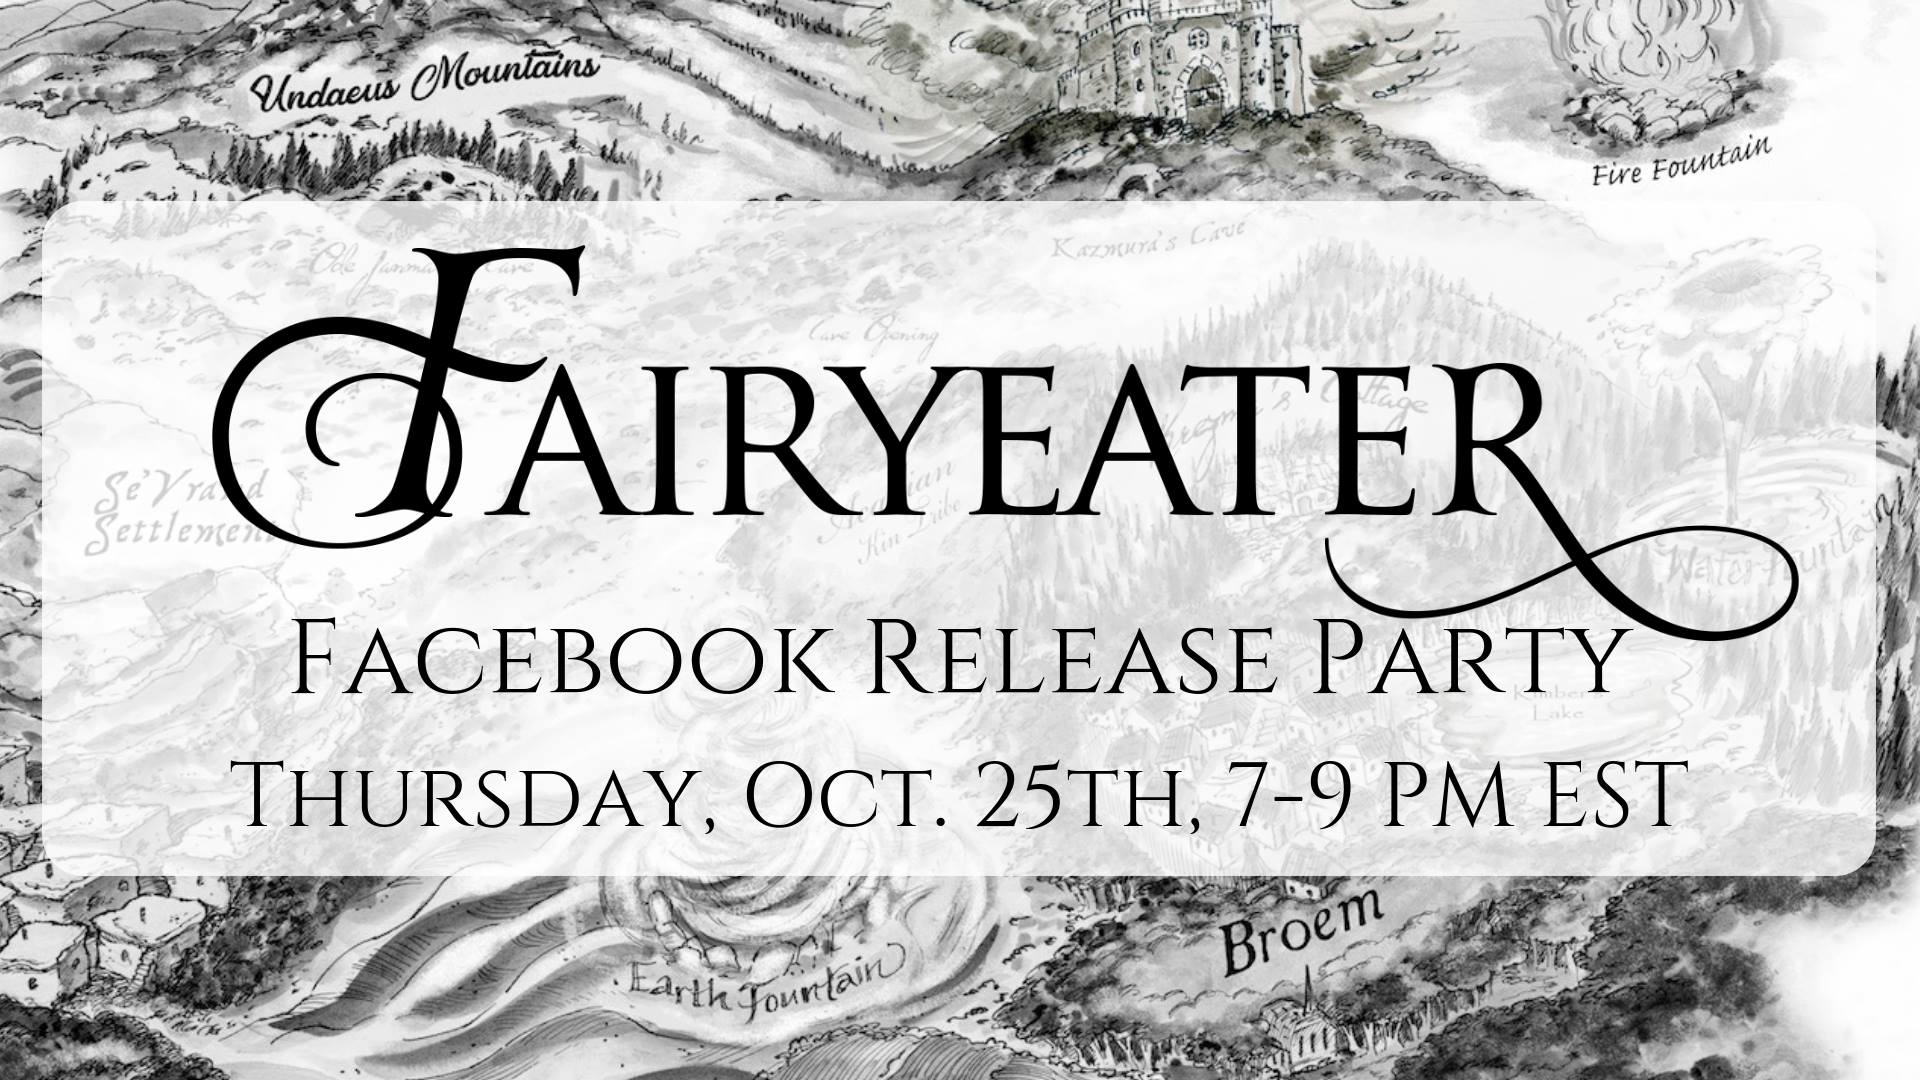 Fairyeater FB party.jpg